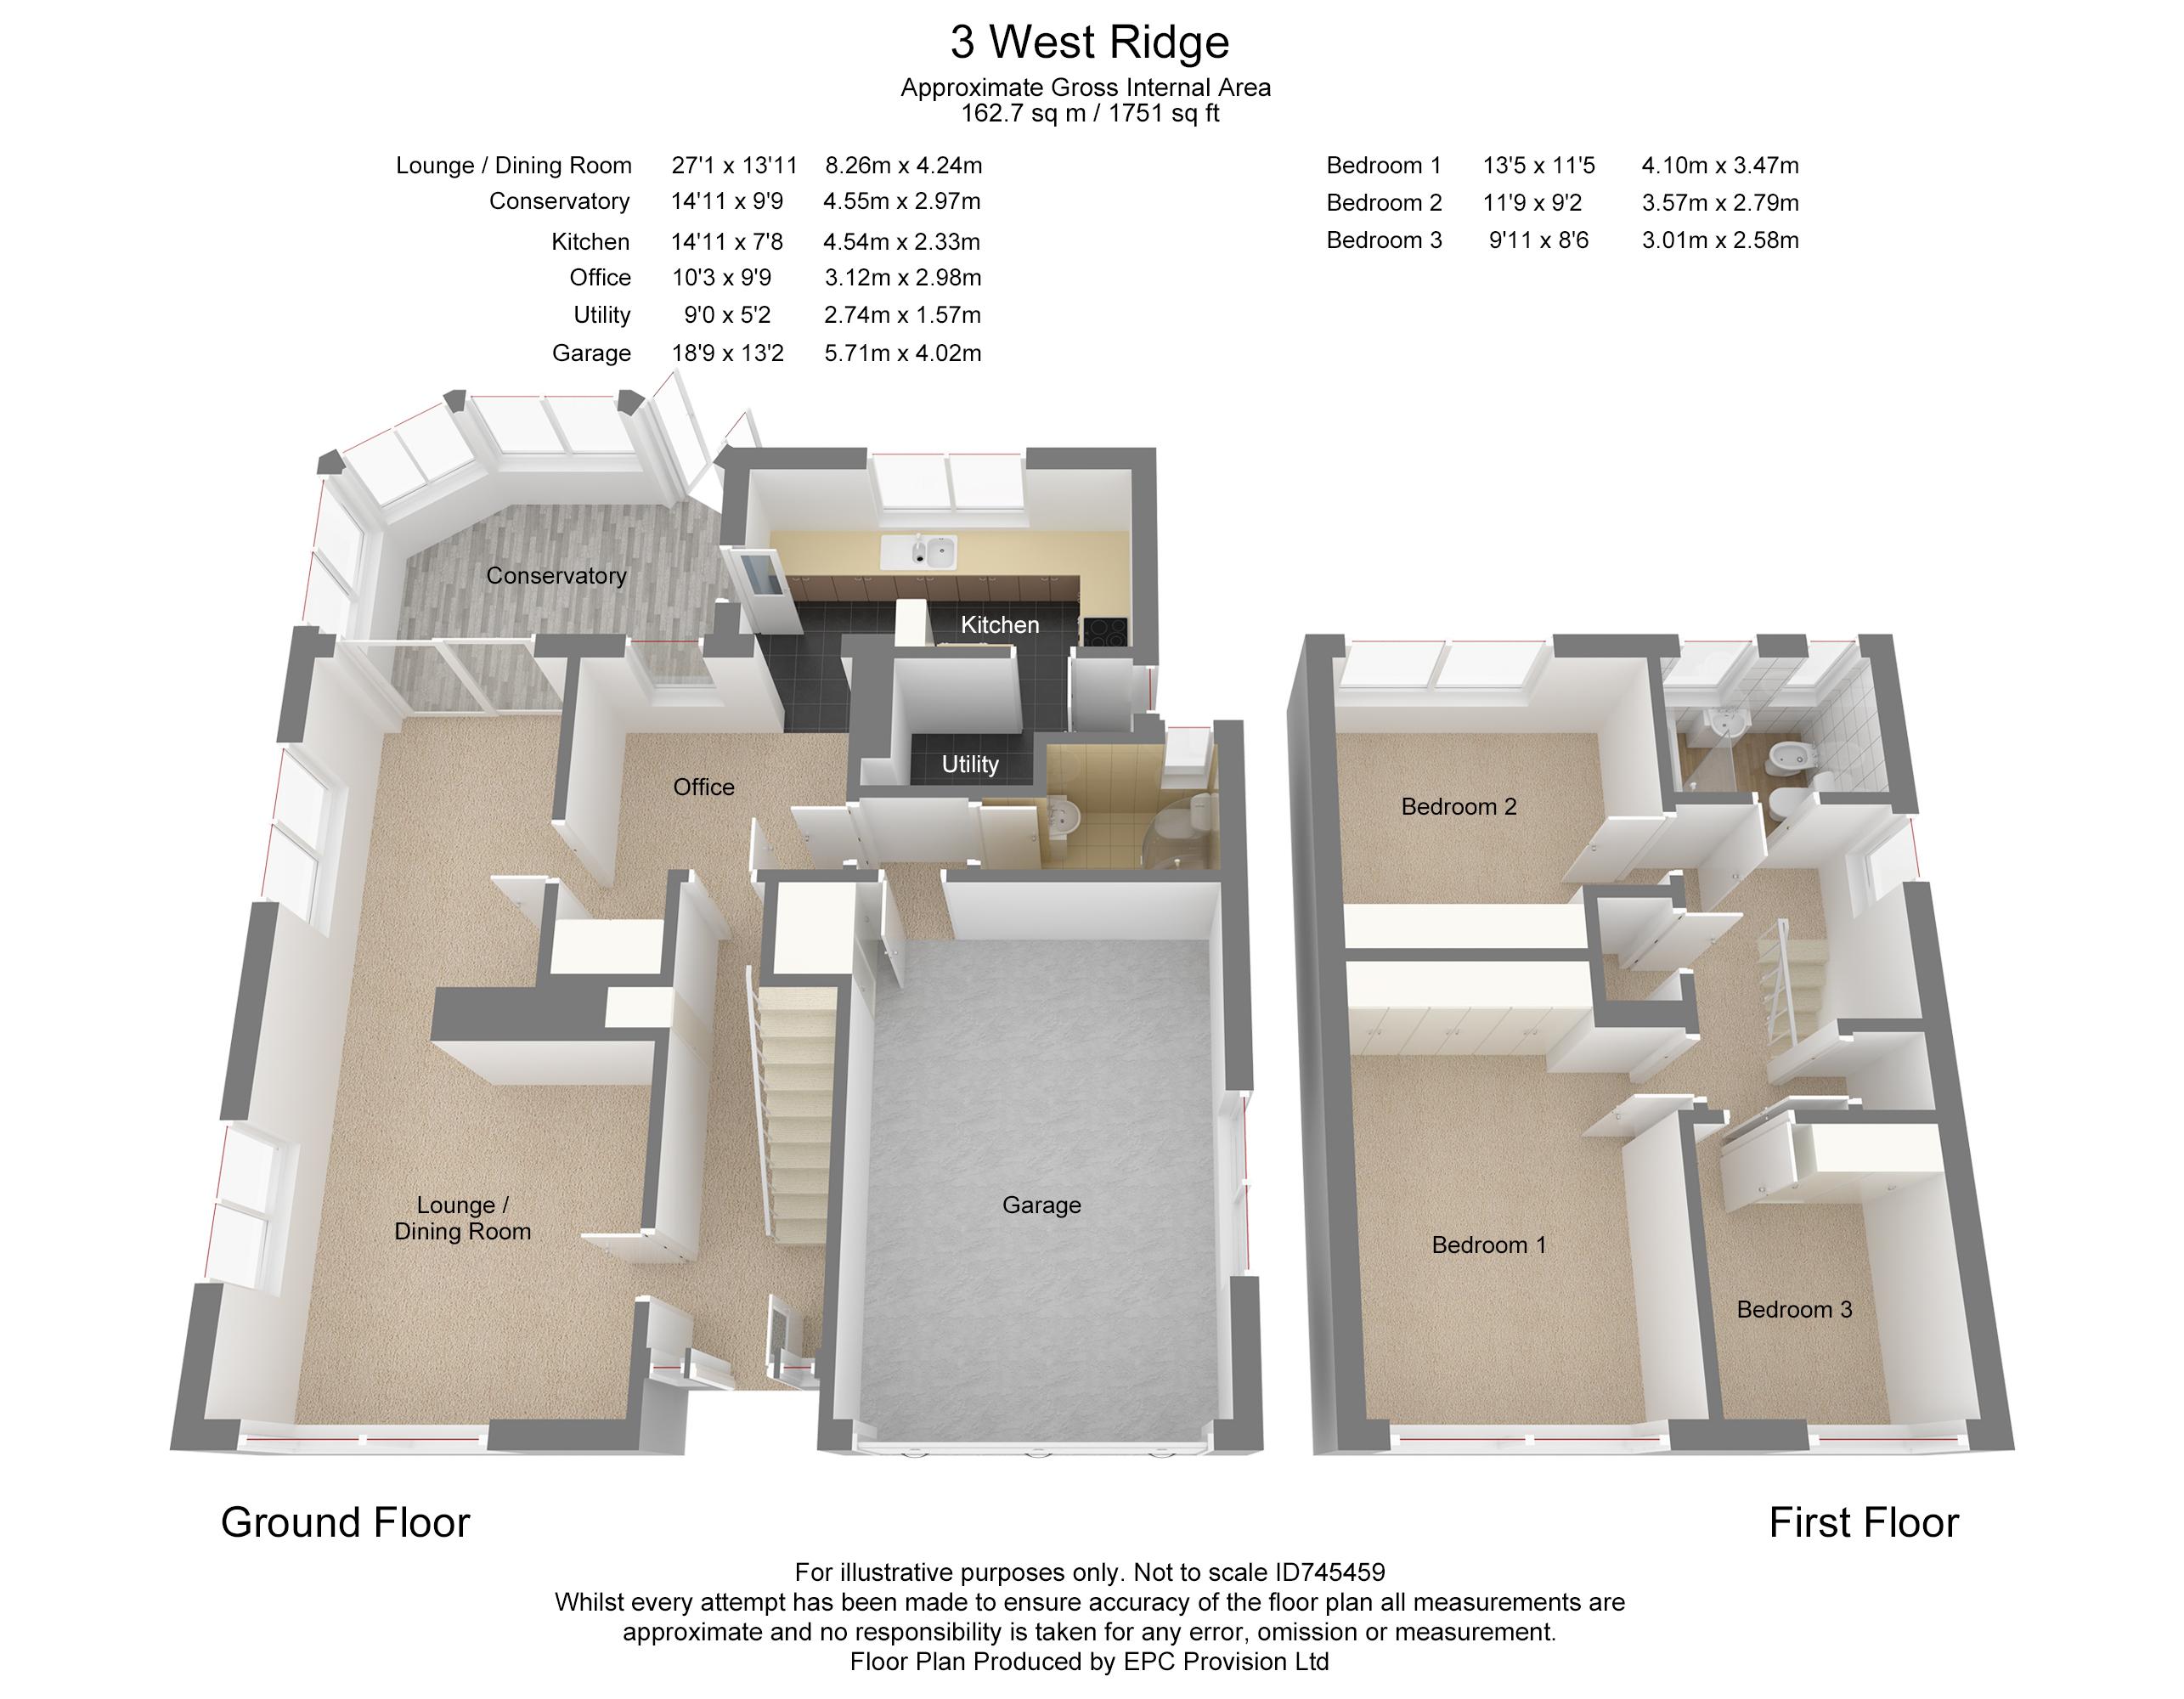 Floorplan for West Ridge, Frampton Cotterell.